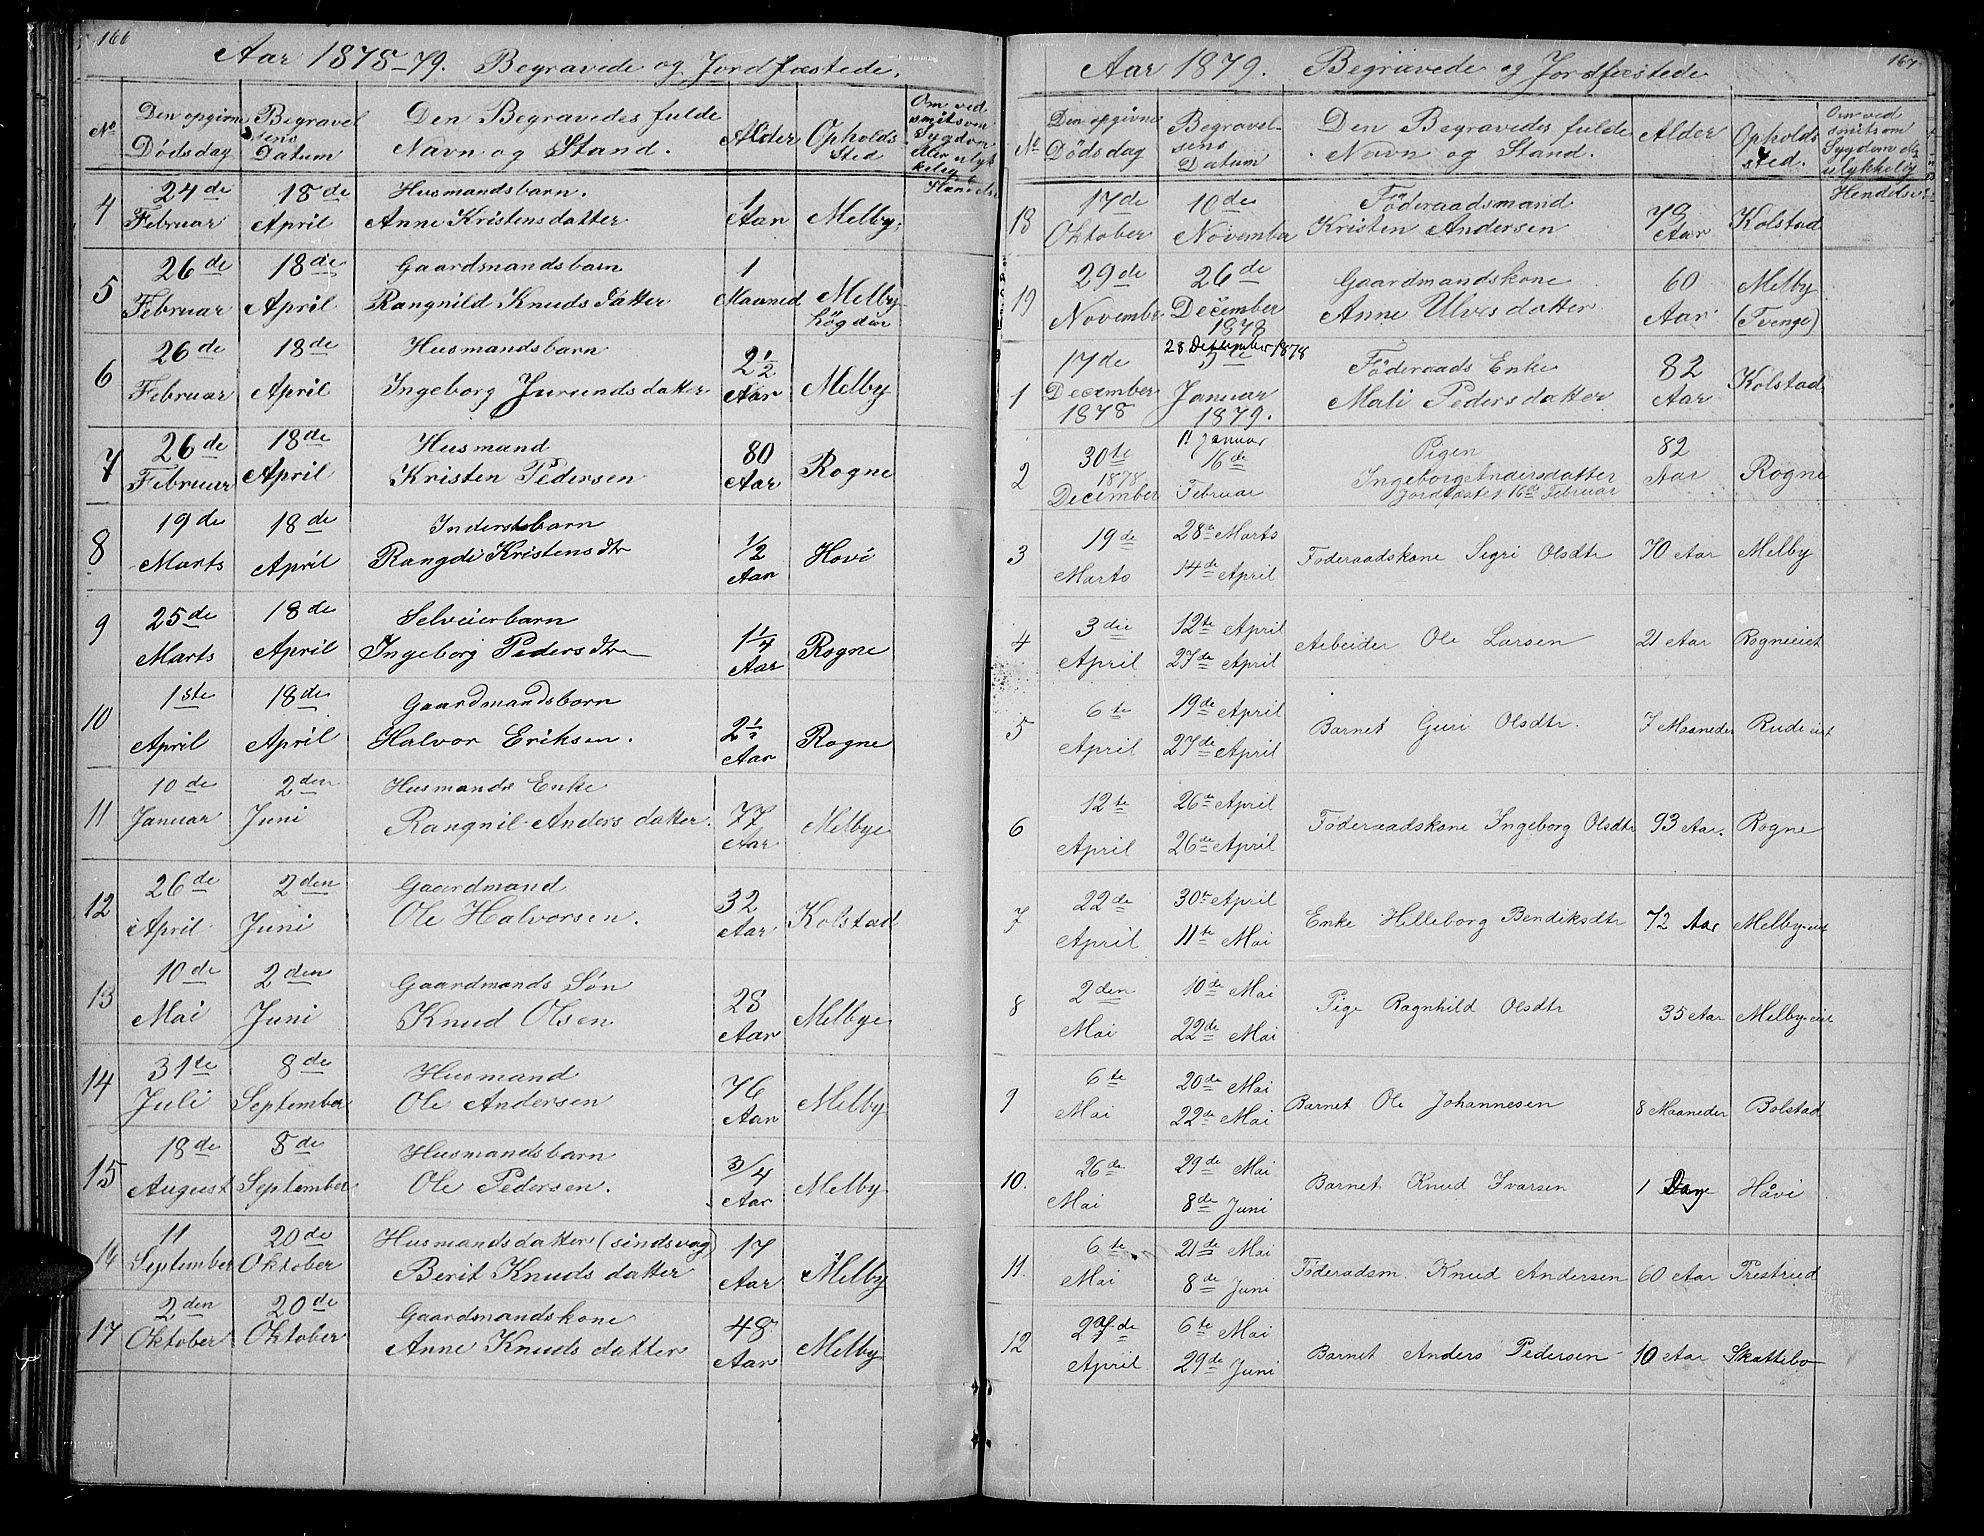 SAH, Øystre Slidre prestekontor, Klokkerbok nr. 3, 1866-1886, s. 166-167